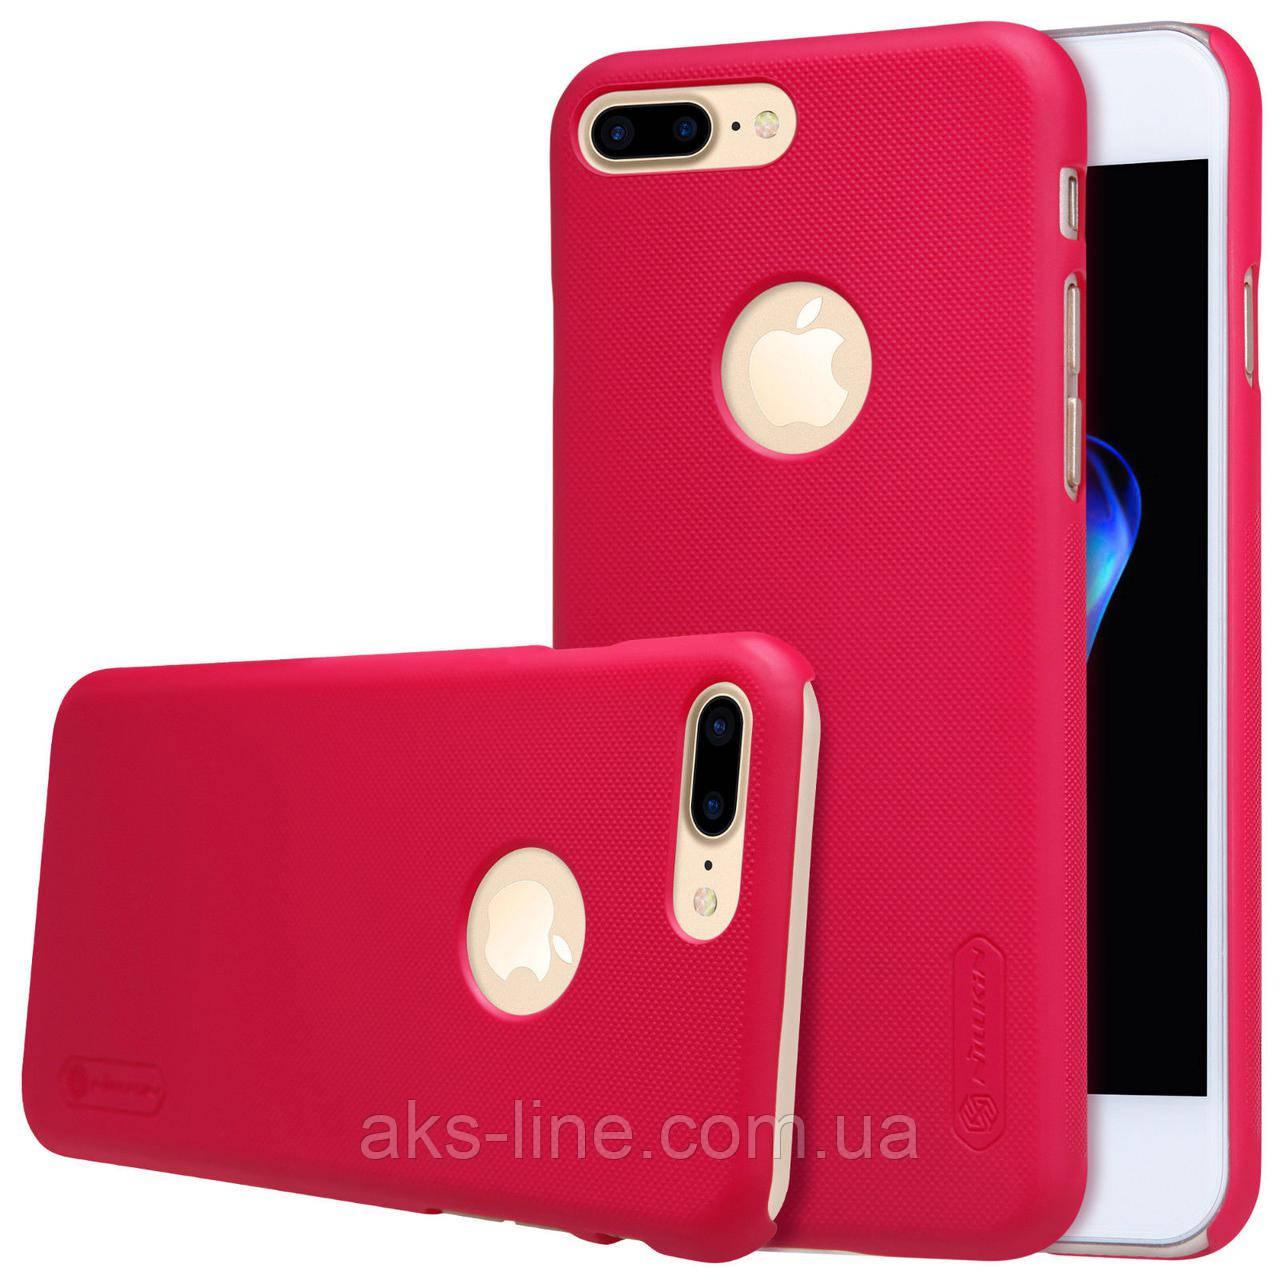 Чехол Nillkin Matte для Apple iPhone 7plus / 8plus (Red) (+ пленка), фото 1